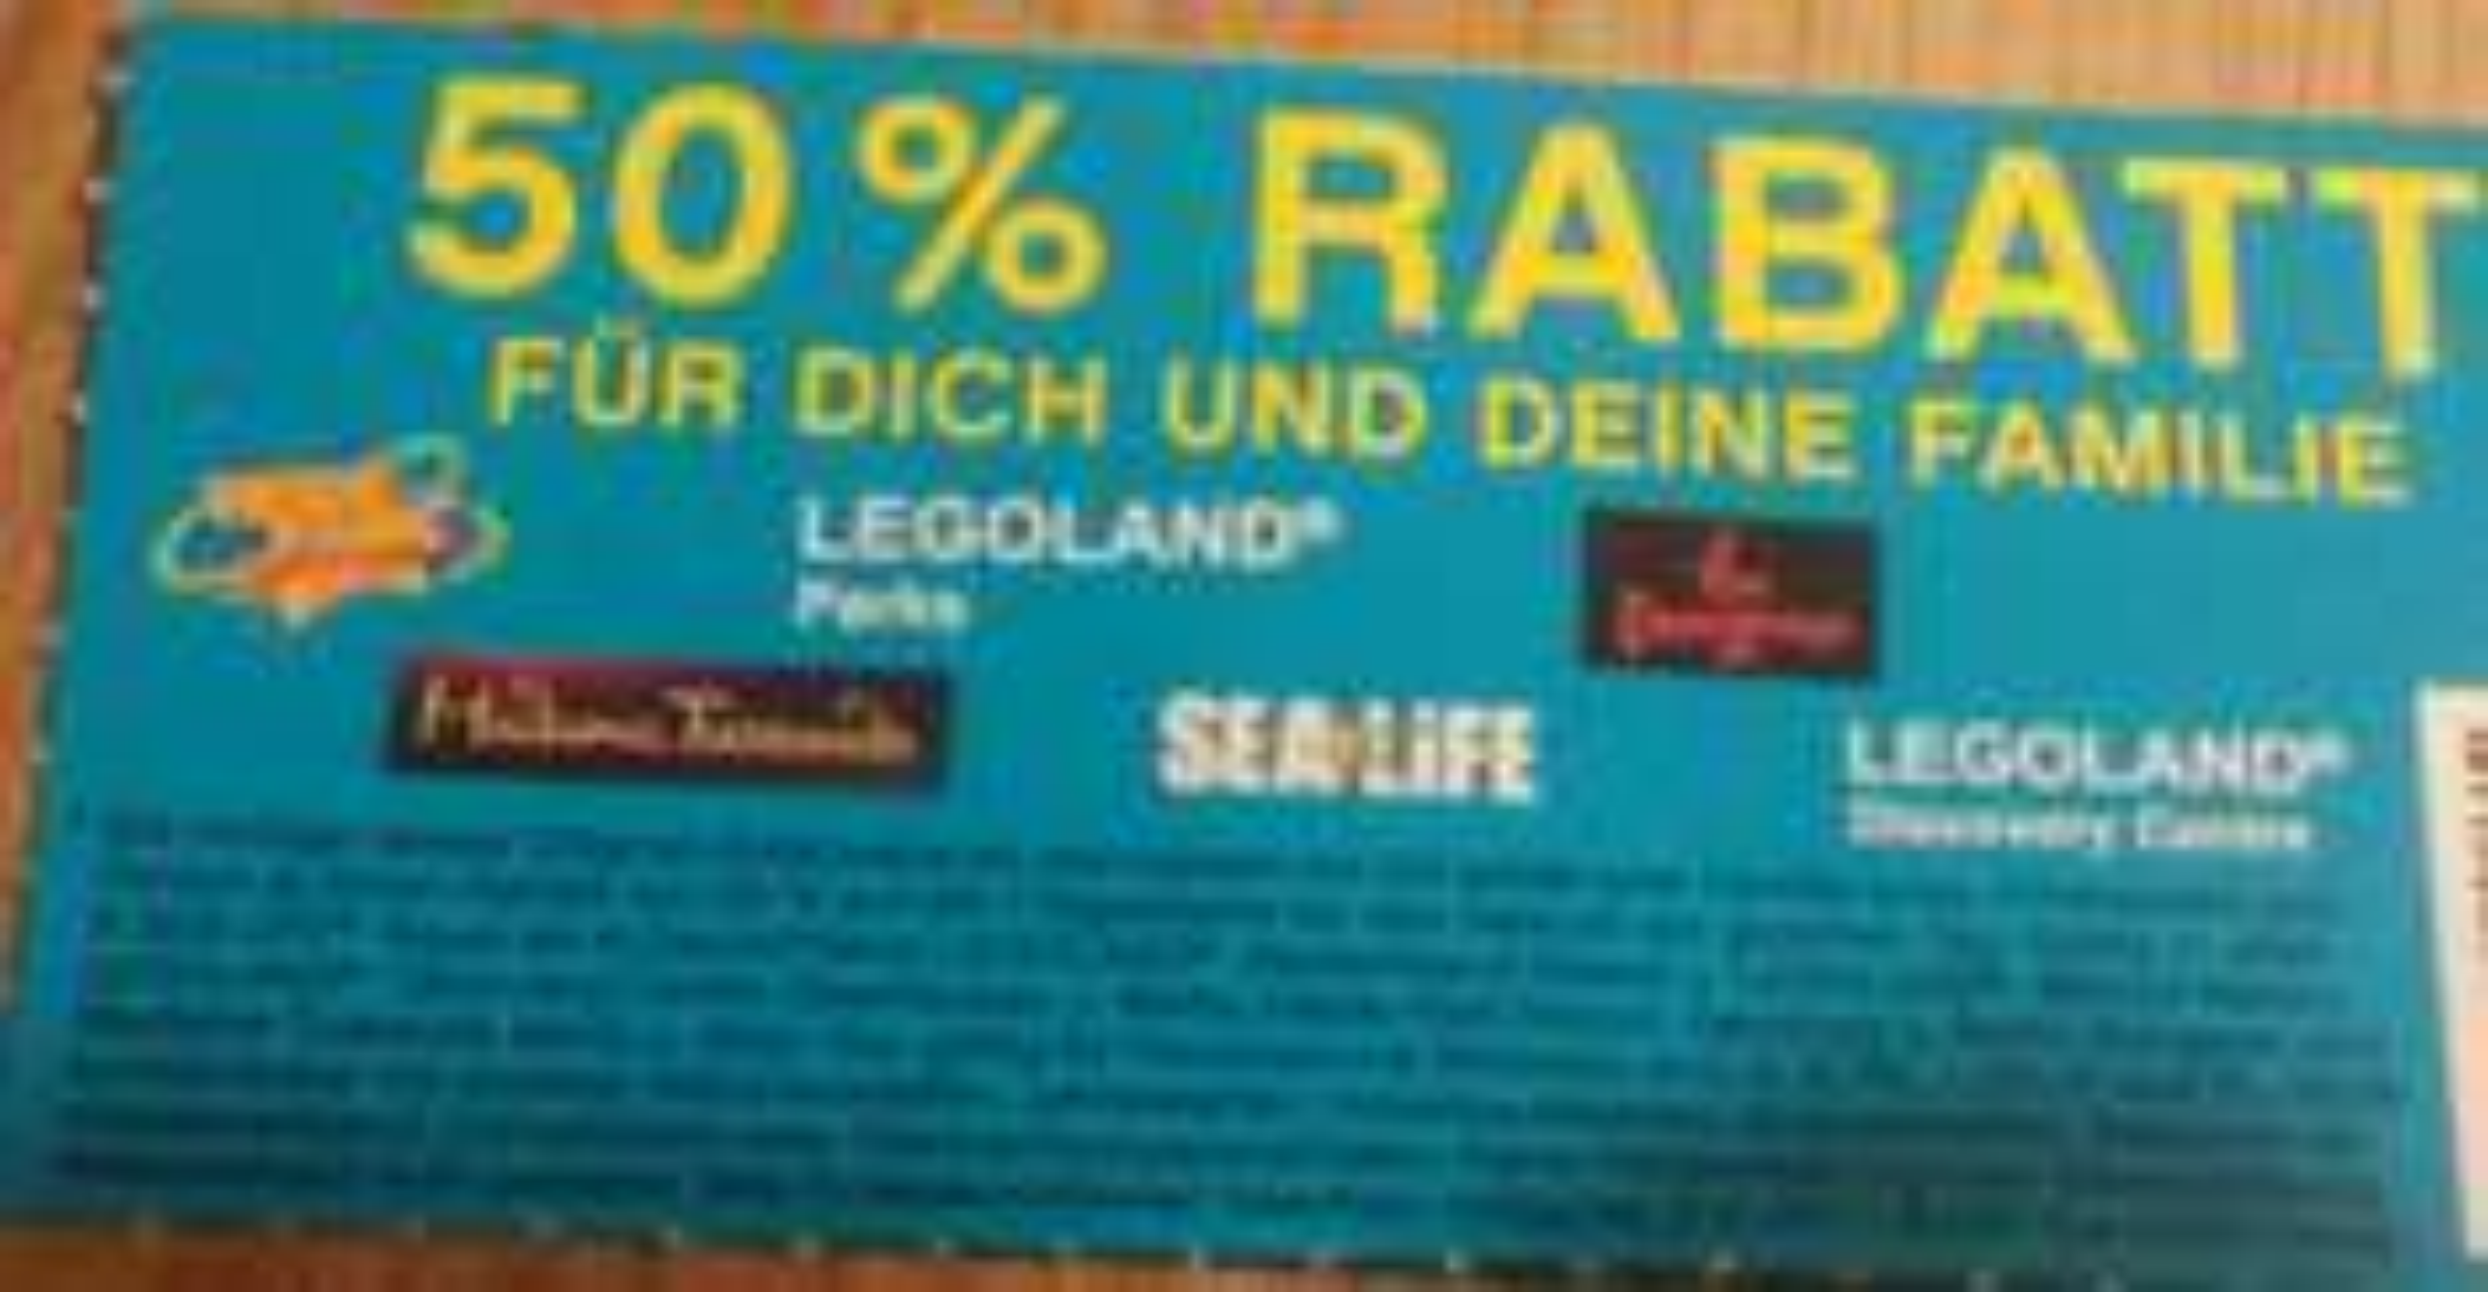 50% Rabatt Coupon für Legoland /Heidepark usw..